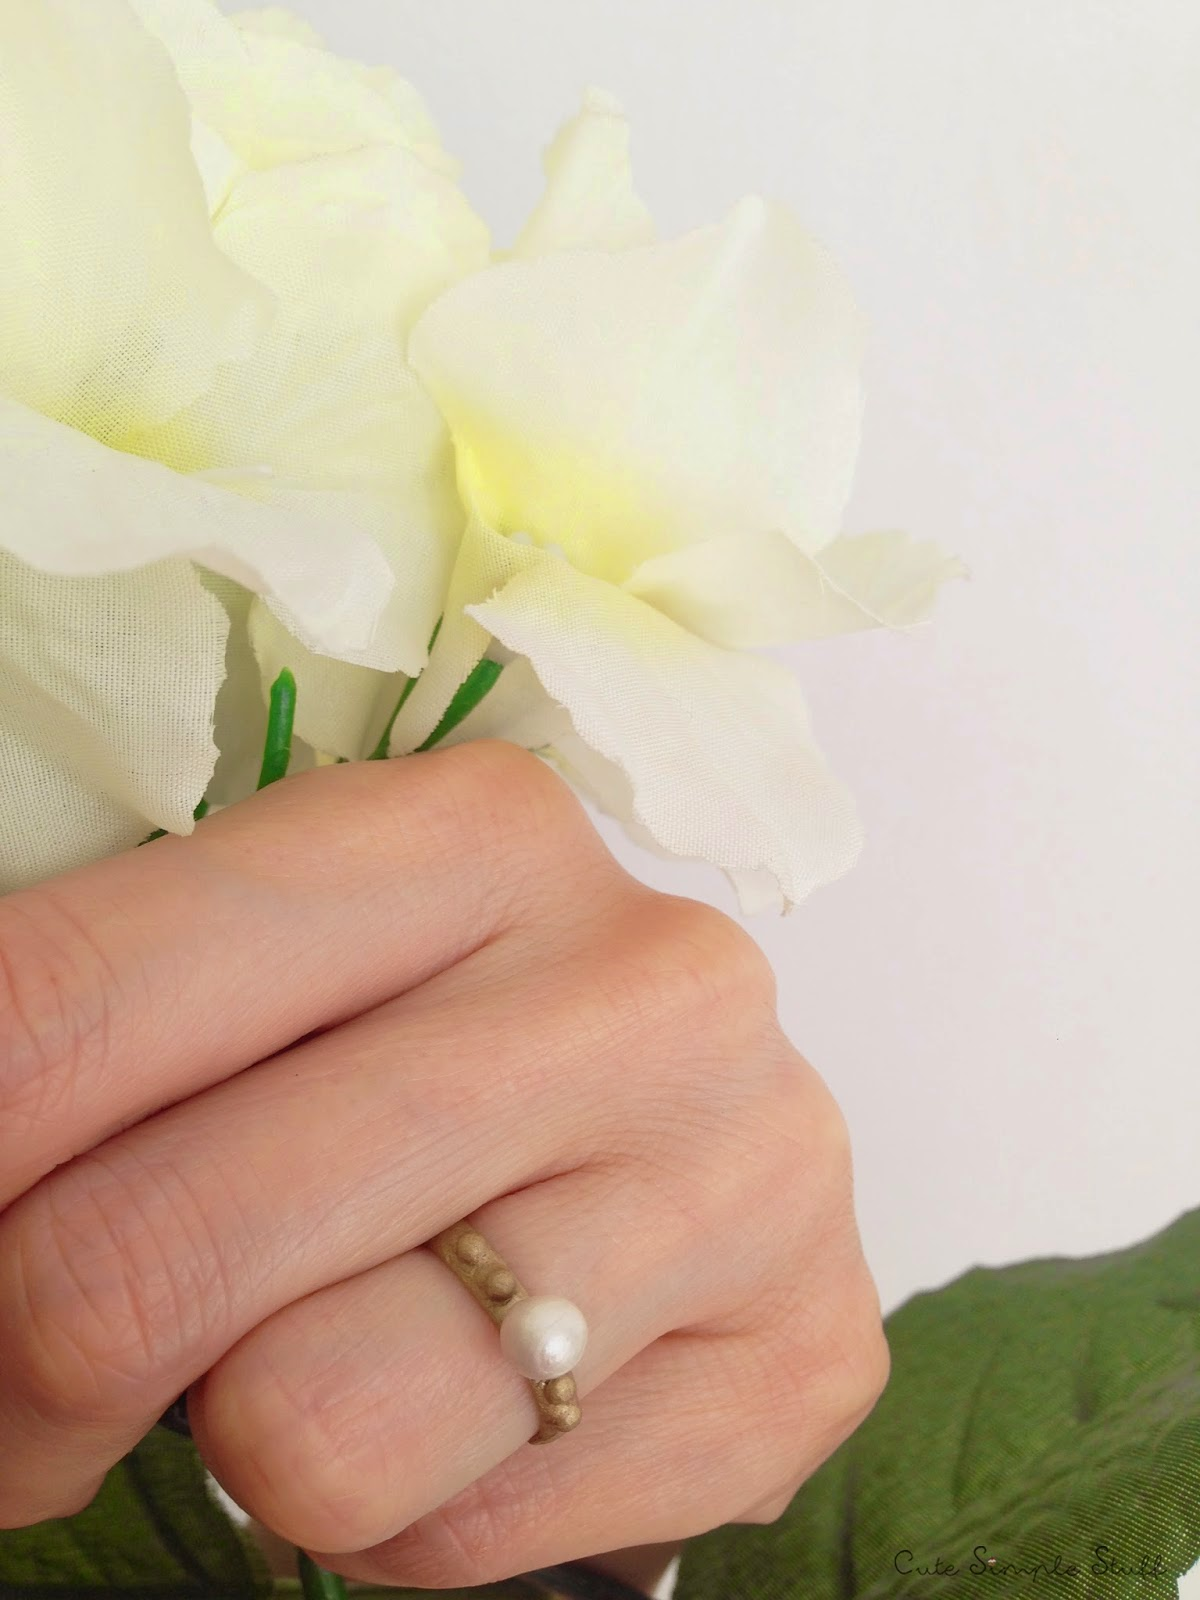 http://www.cutesimplestuff.com/2015/04/she-said-yes.html